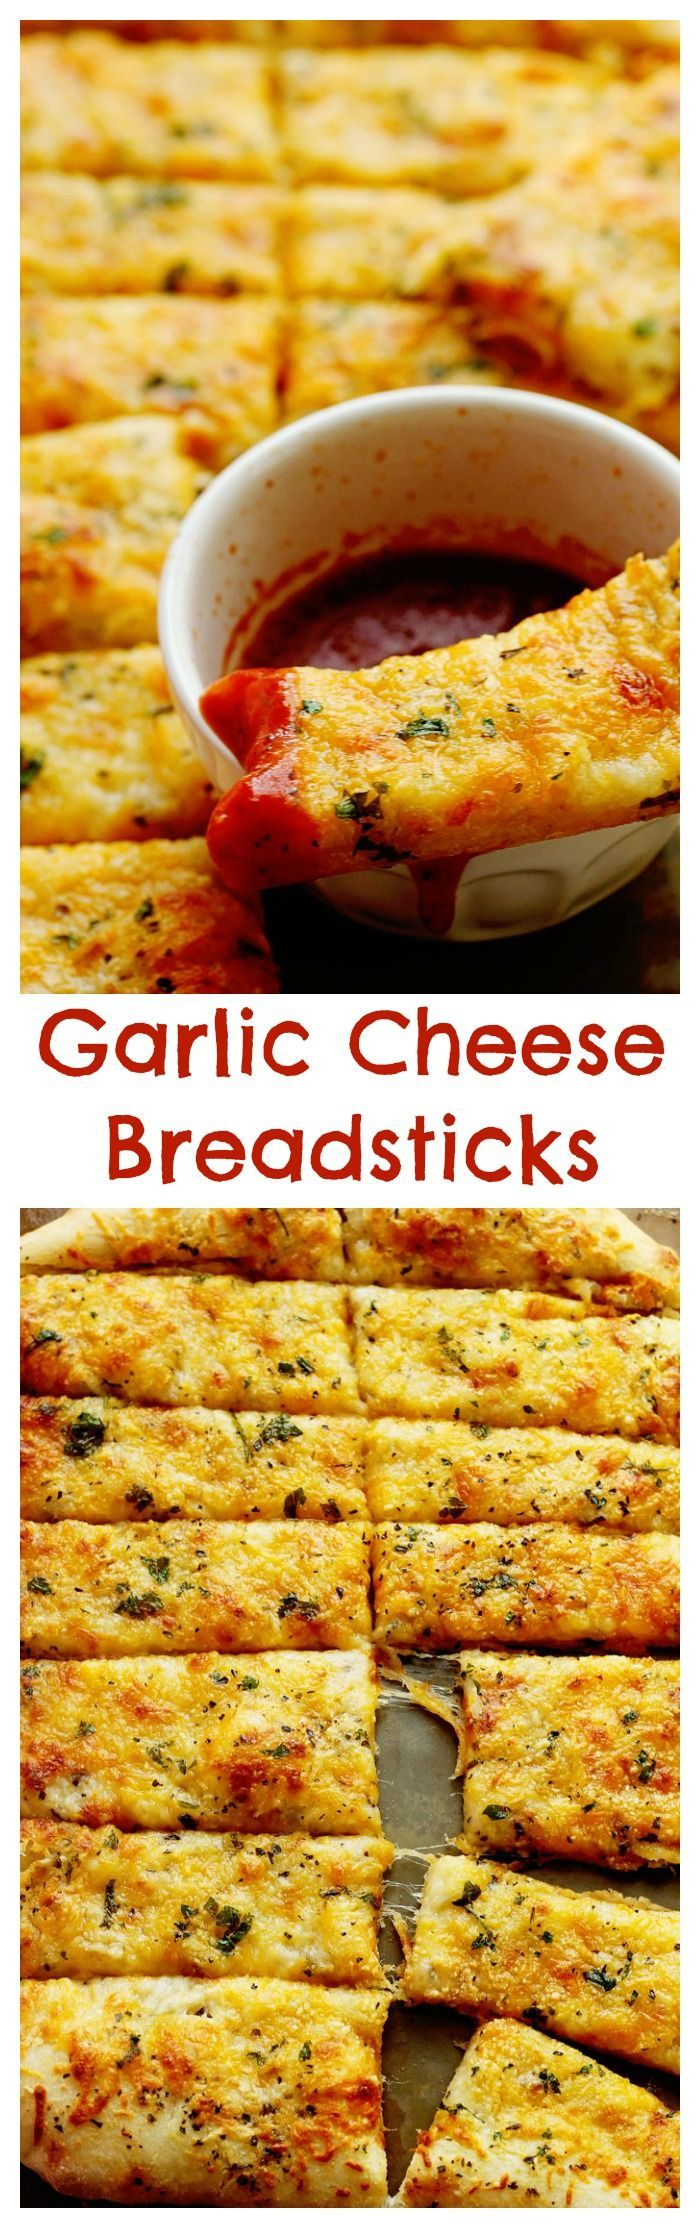 Garlic Cheese Breadsticks | Grandbaby Cakes (scheduled via http://www.tailwindapp.com?utm_source=pinterest&utm_medium=twpin&utm_content=post768663&utm_campaign=scheduler_attribution)